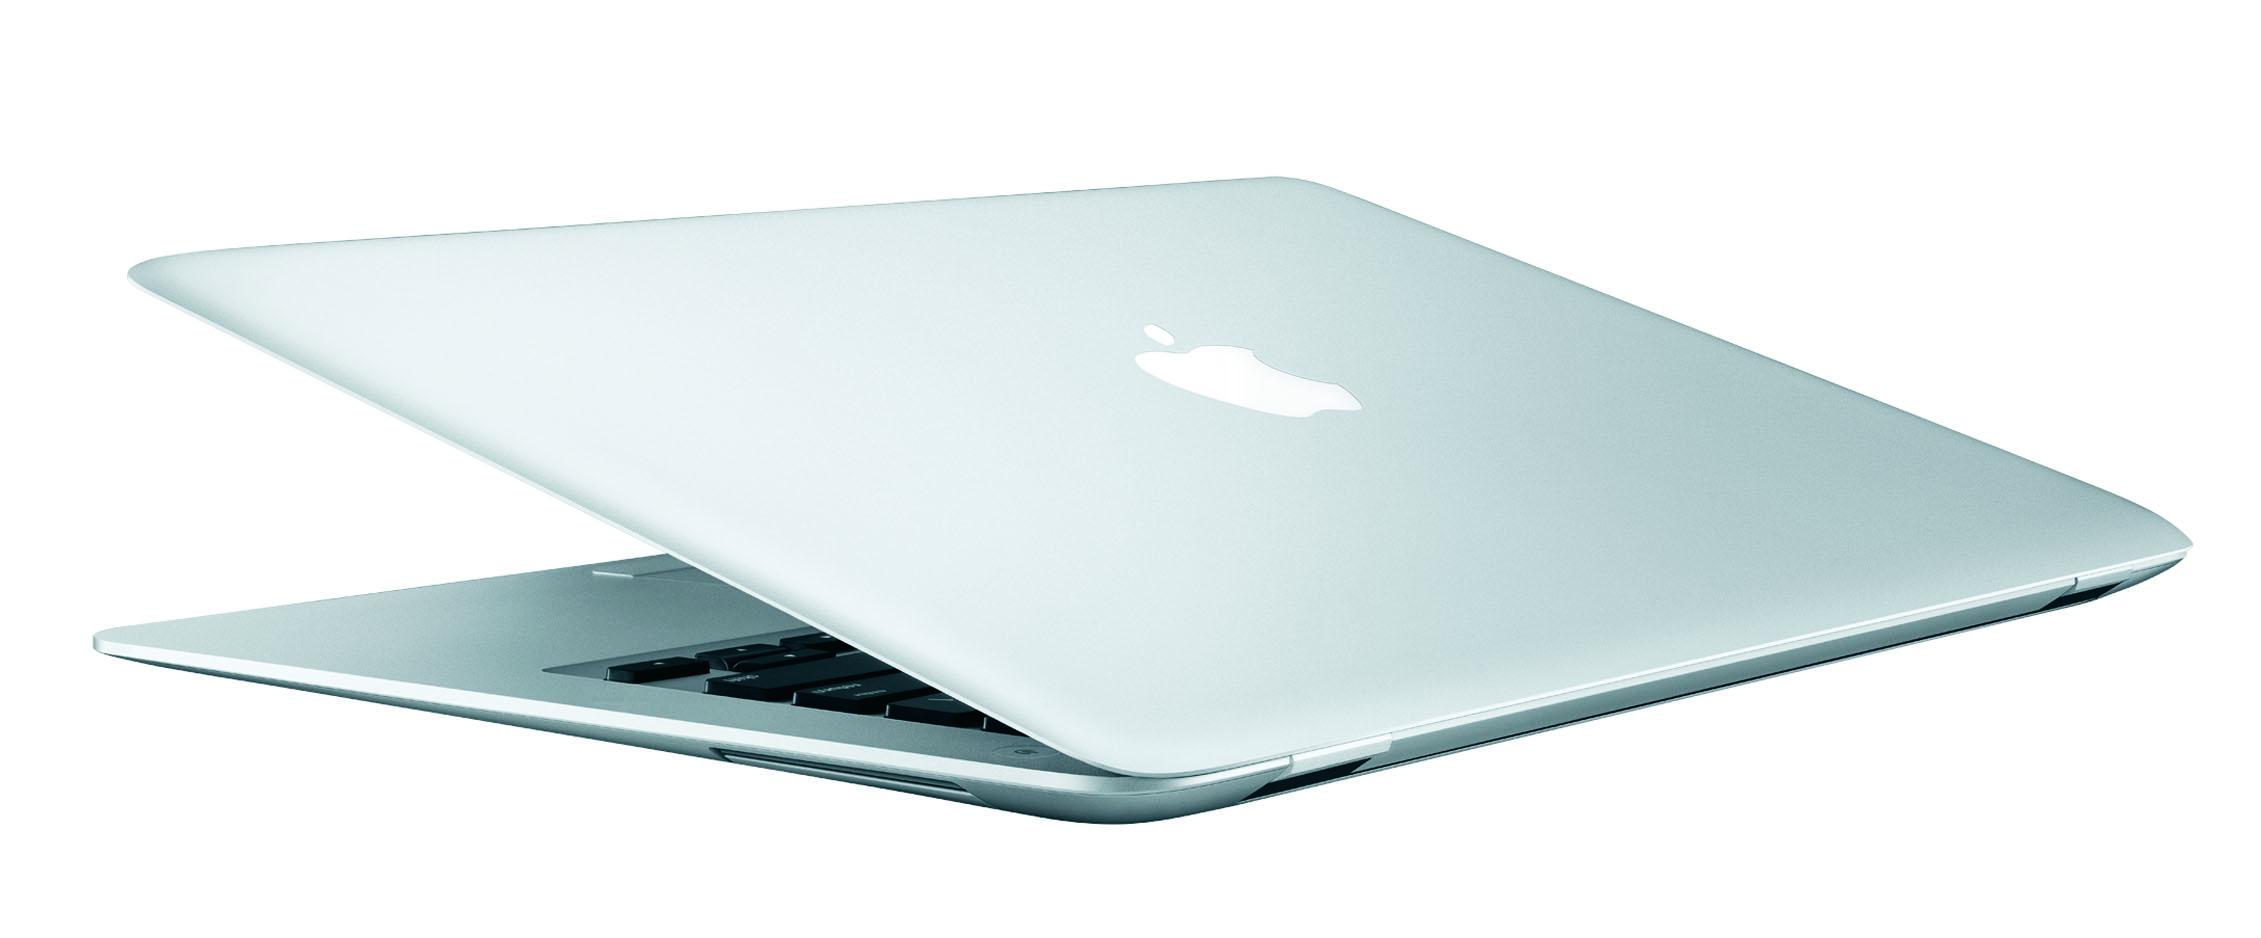 Apple launches MacBook Air PC